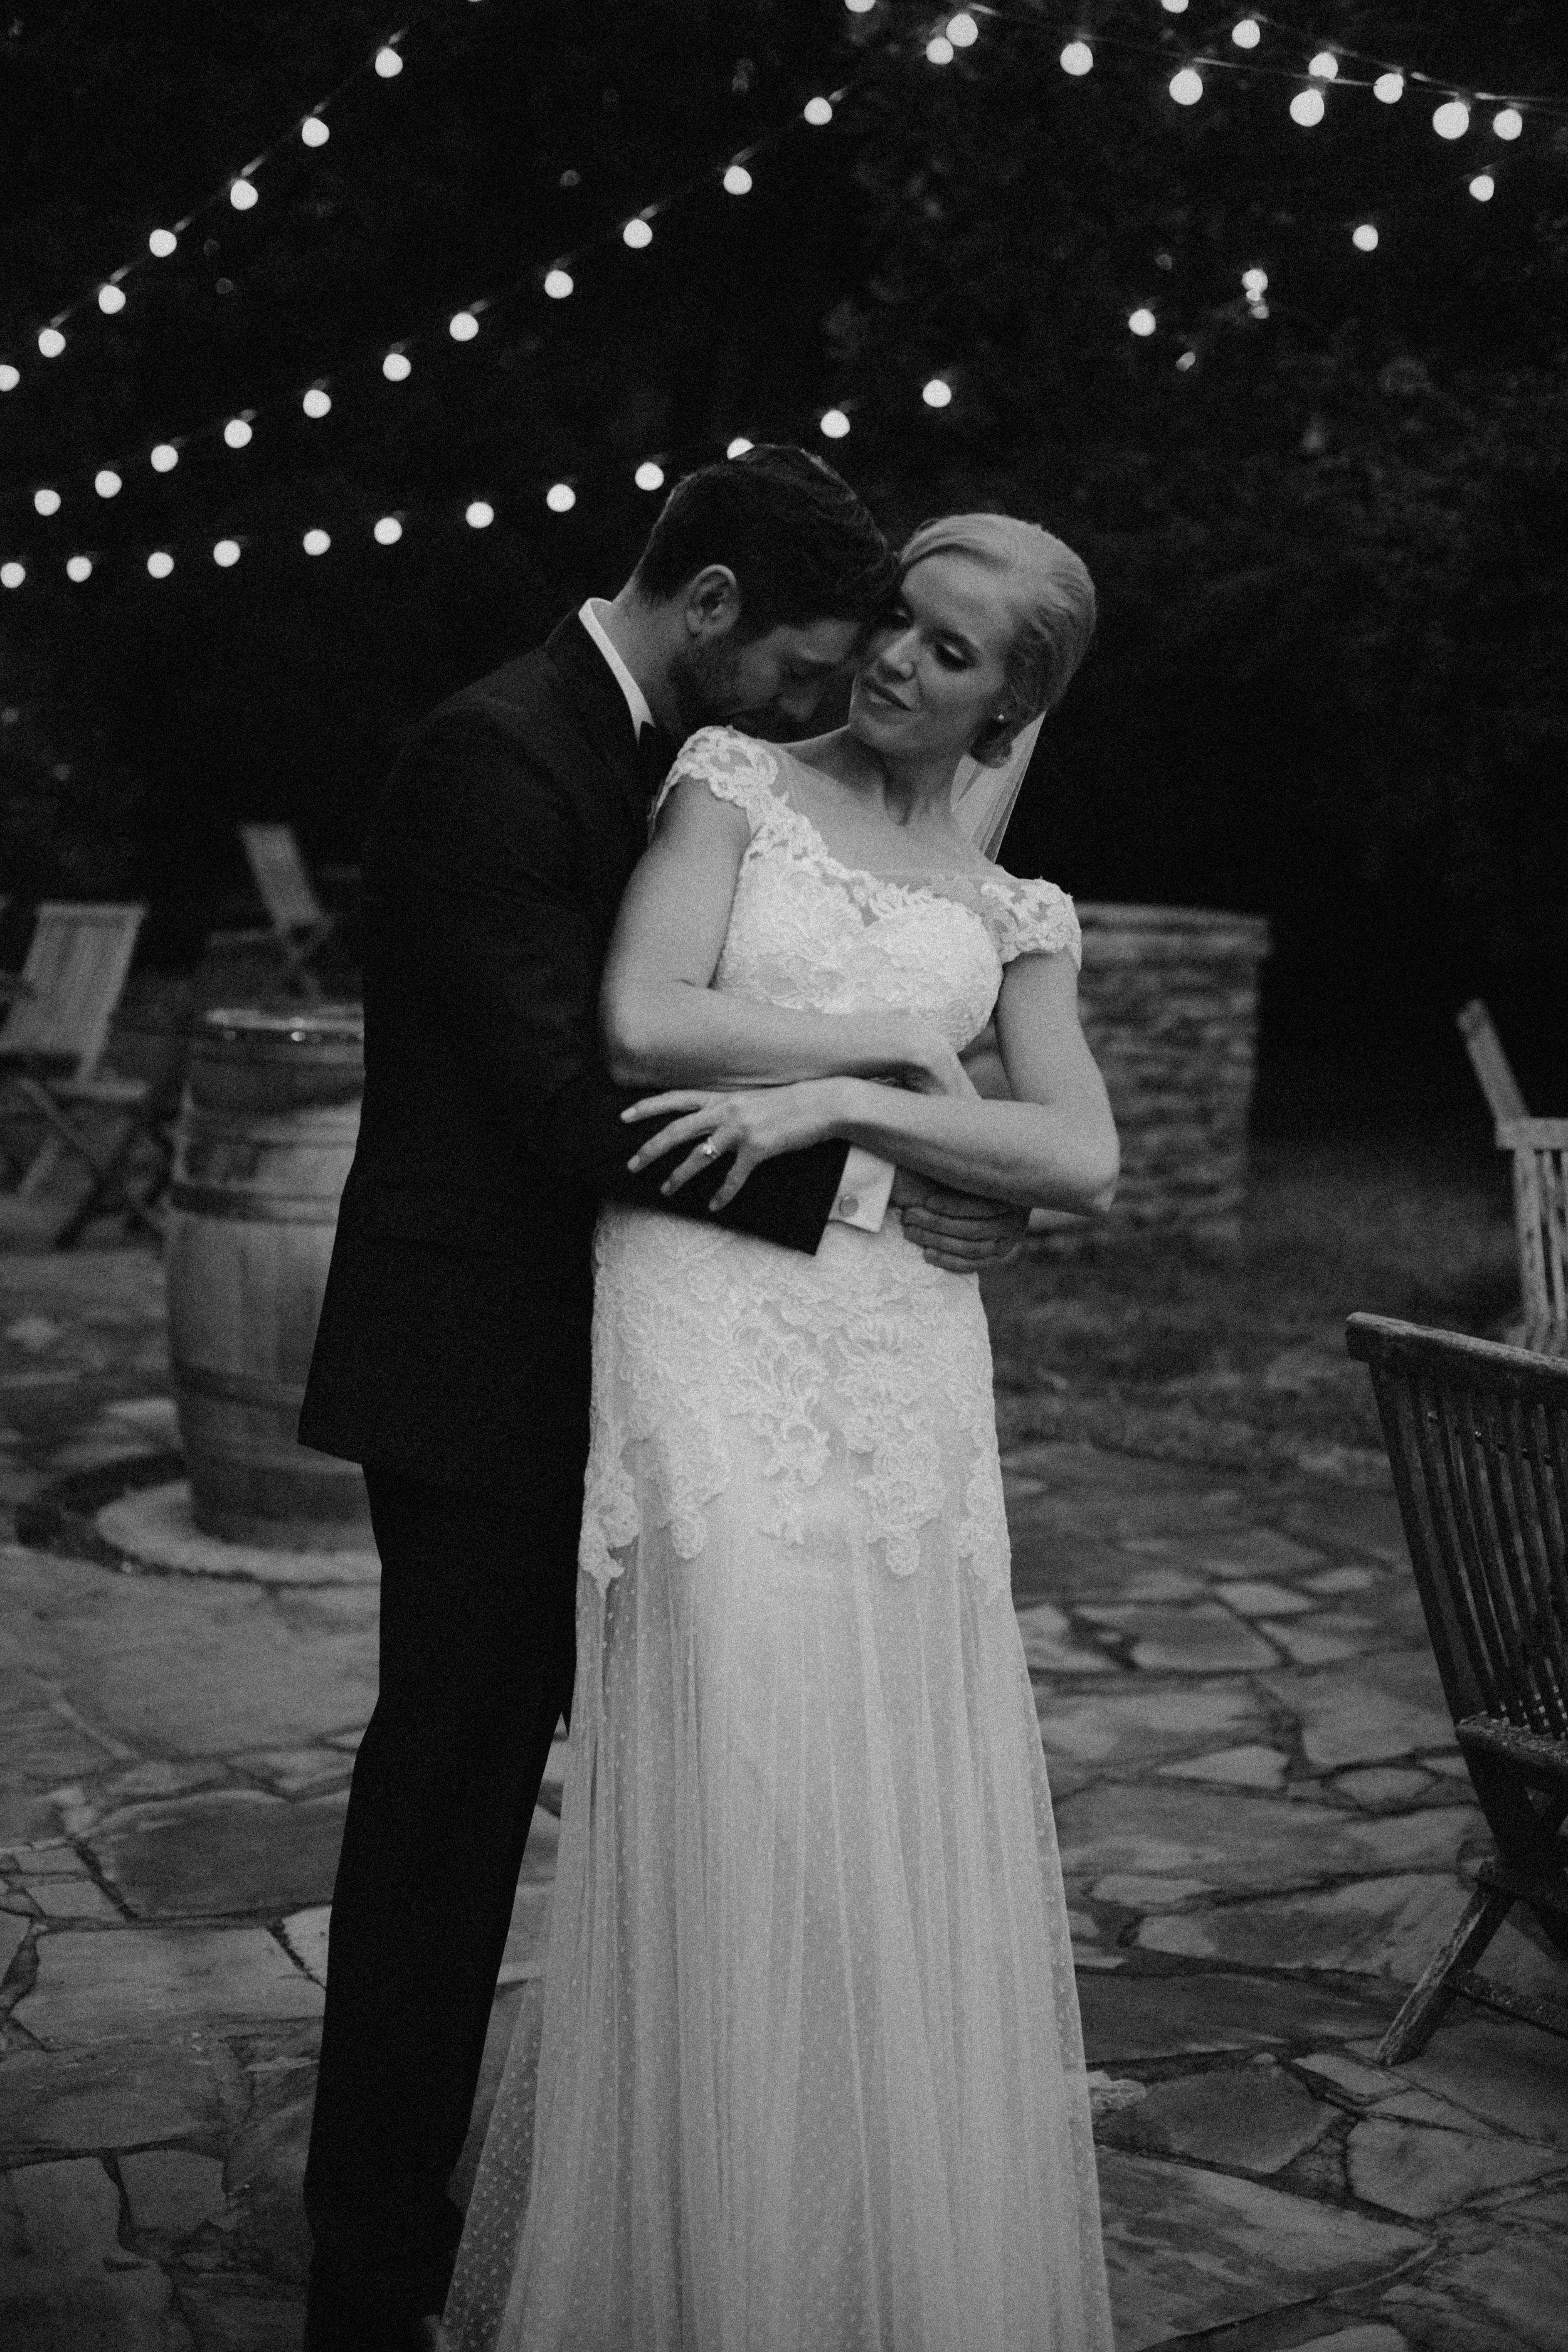 Nashville Wedding Photography by Saul Cervantes Photography-68.jpg